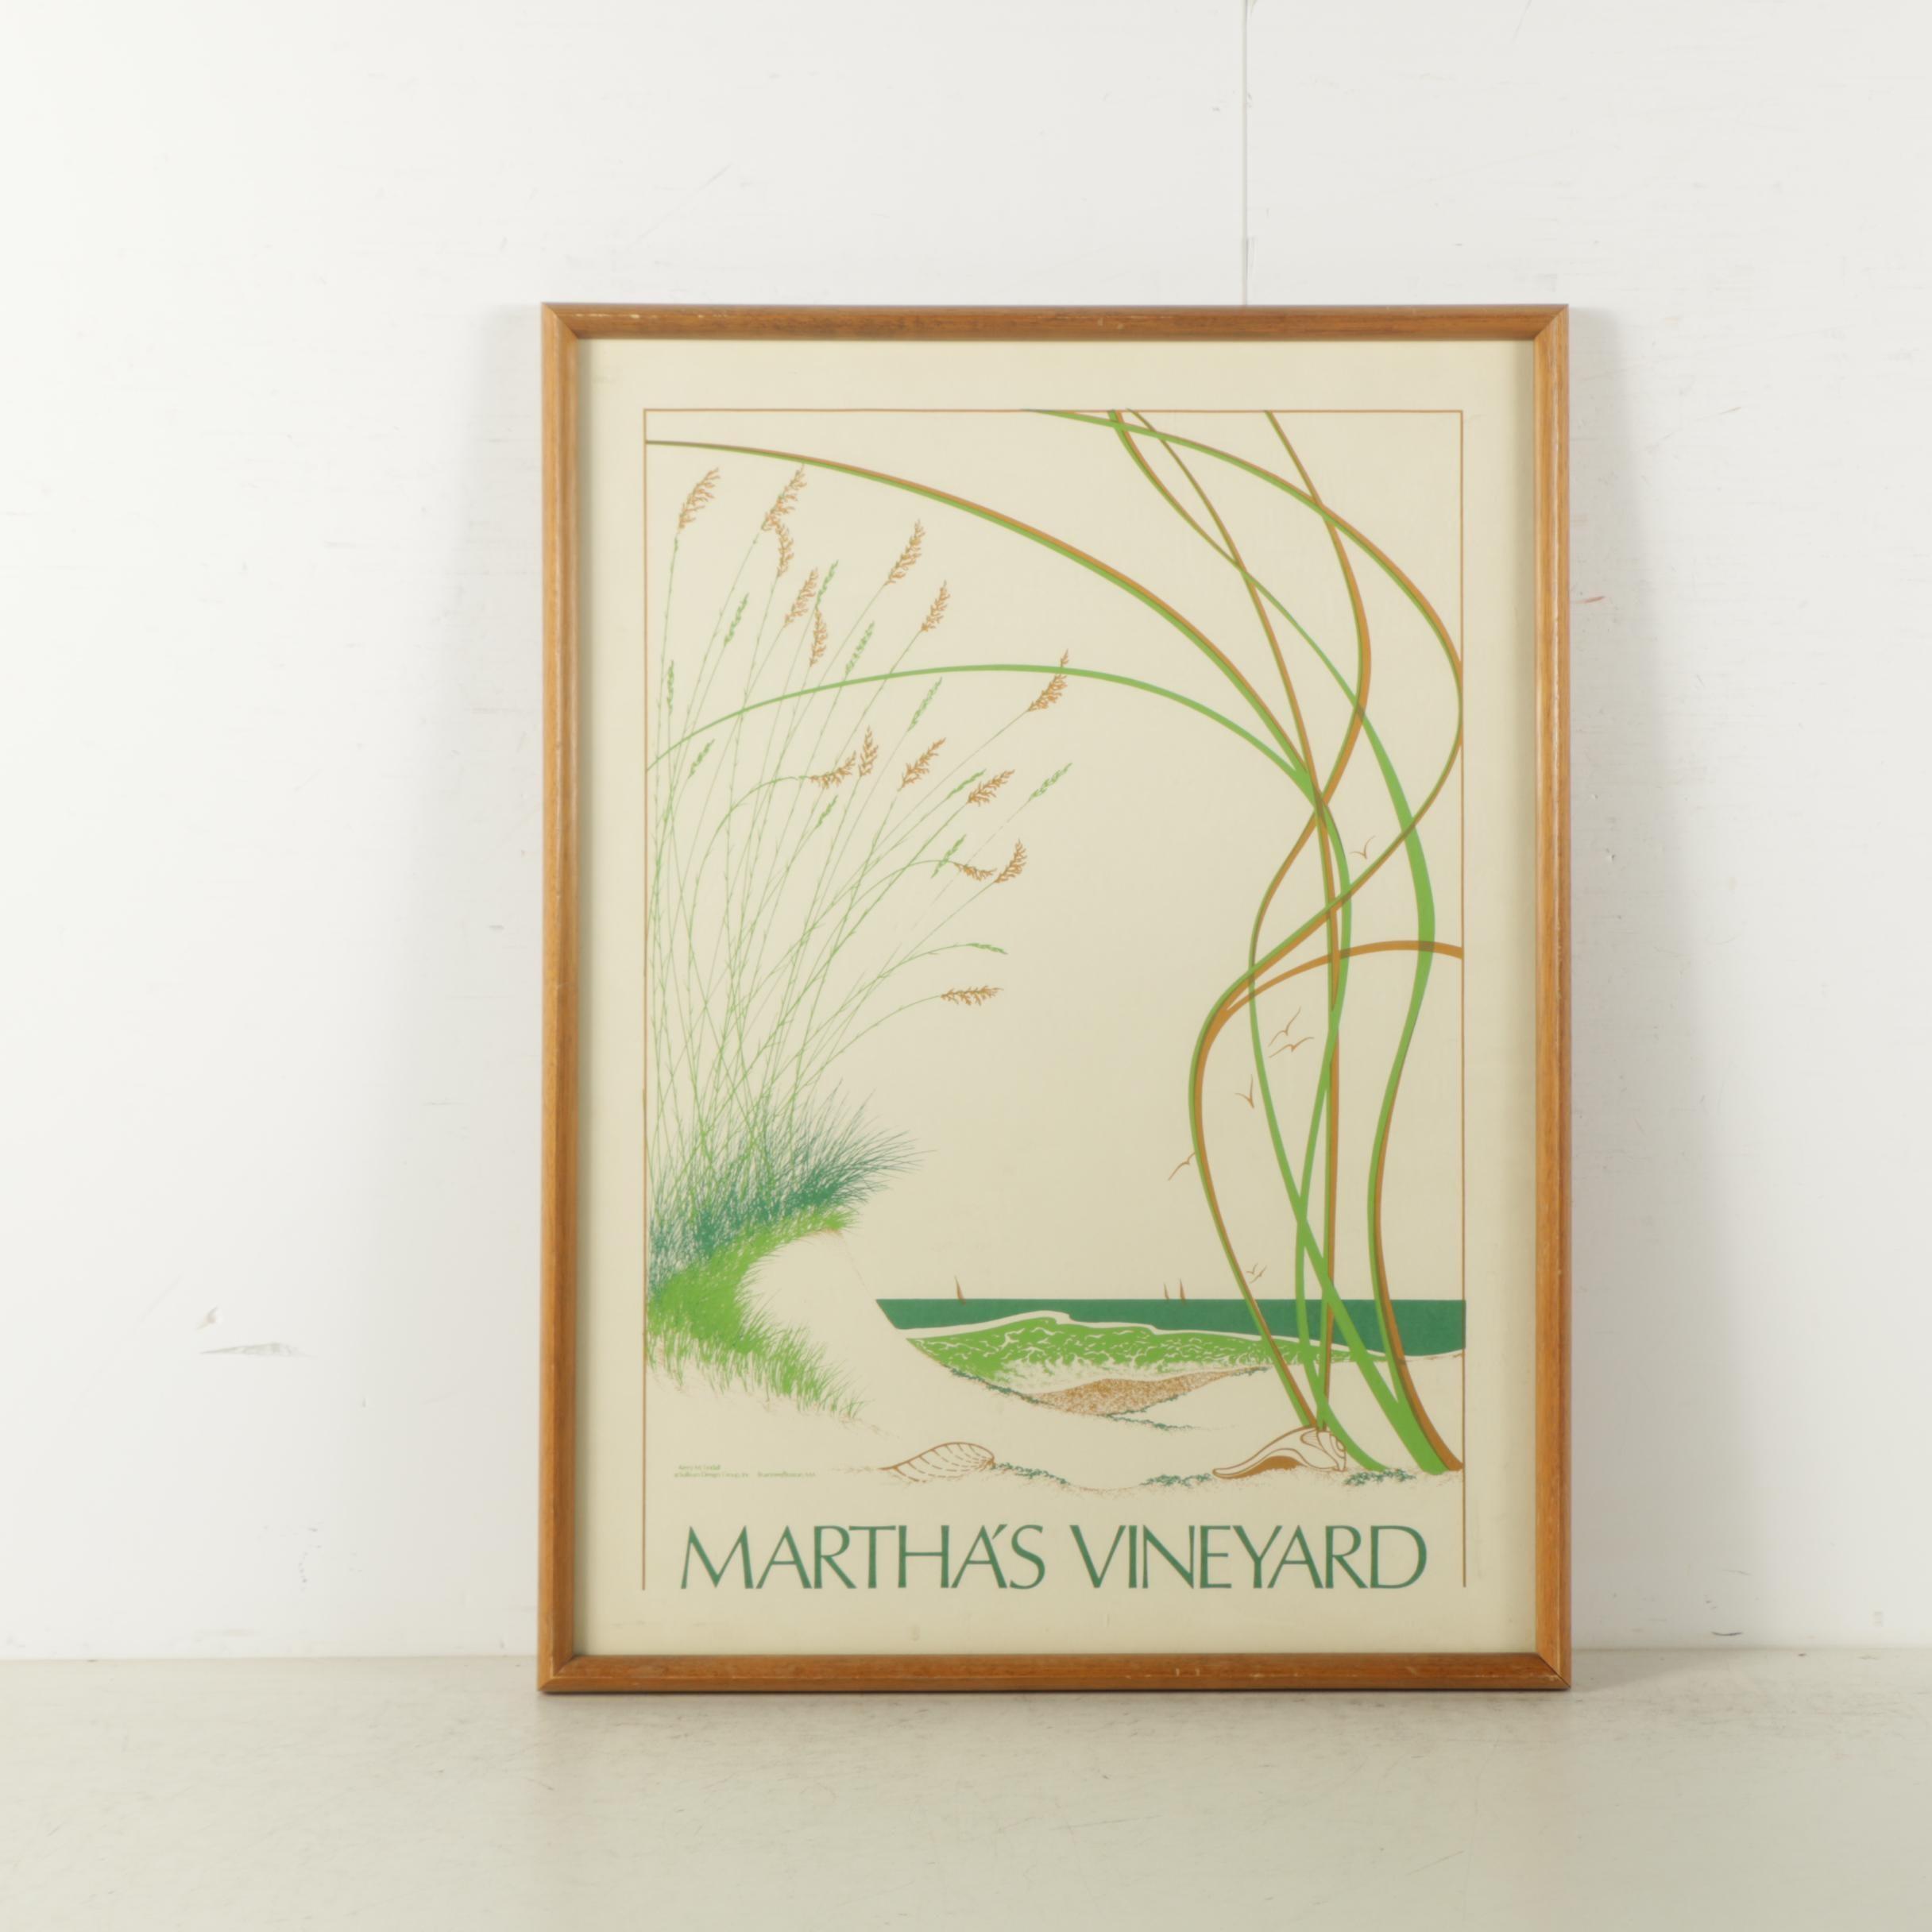 Circa 1980s Martha's Vineyard Serigraph Poster after Kerry M. Tindall